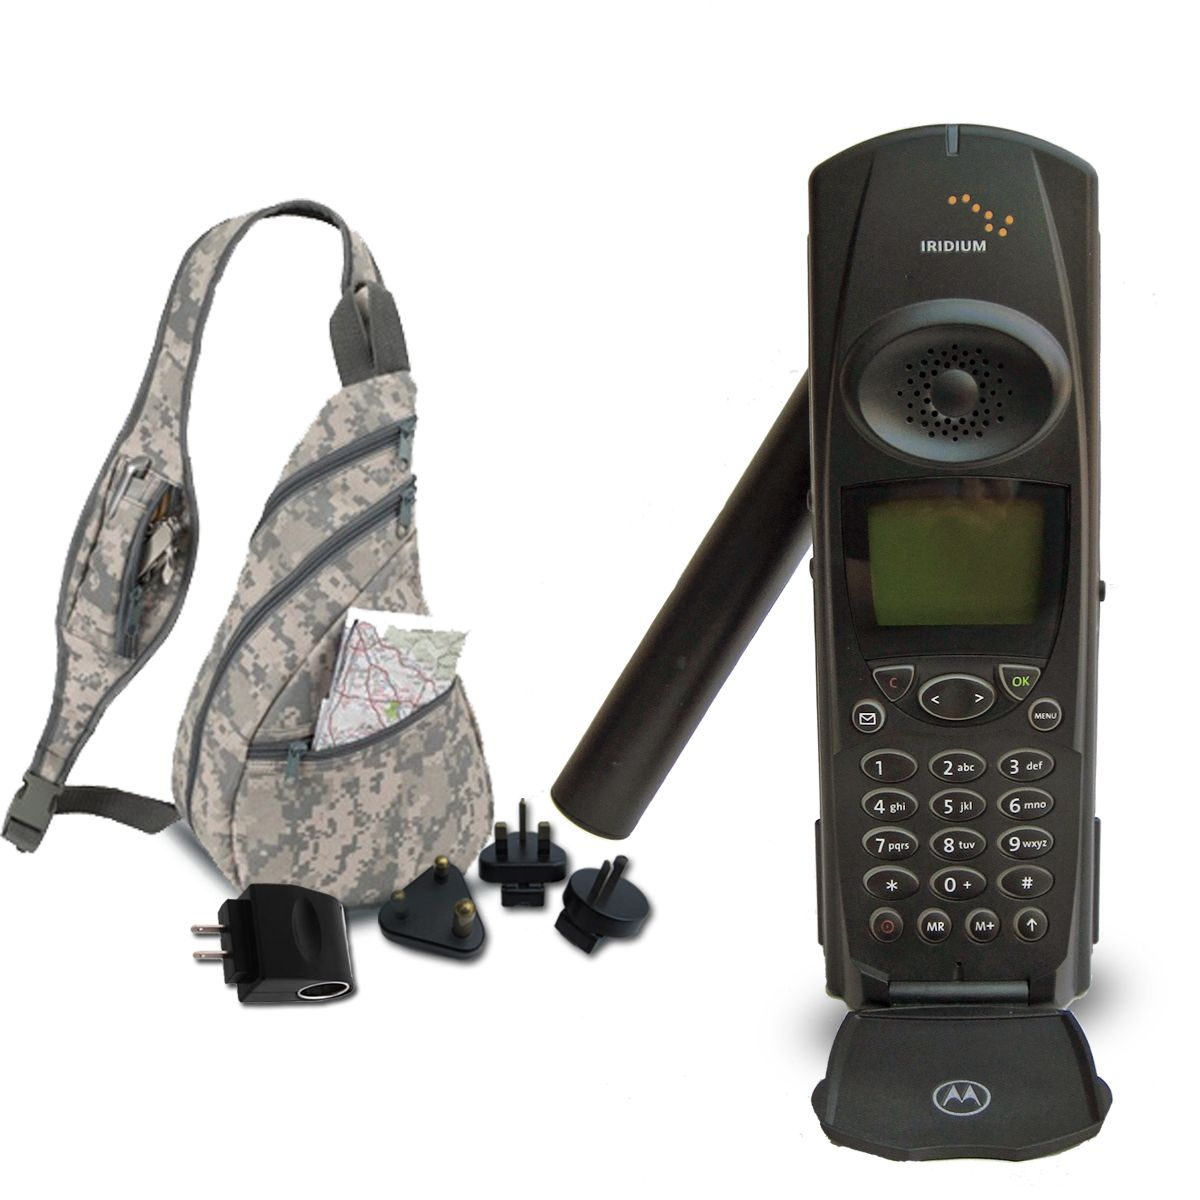 Iridium Motorola 9500 Satellite Phone w/BackpackUsed